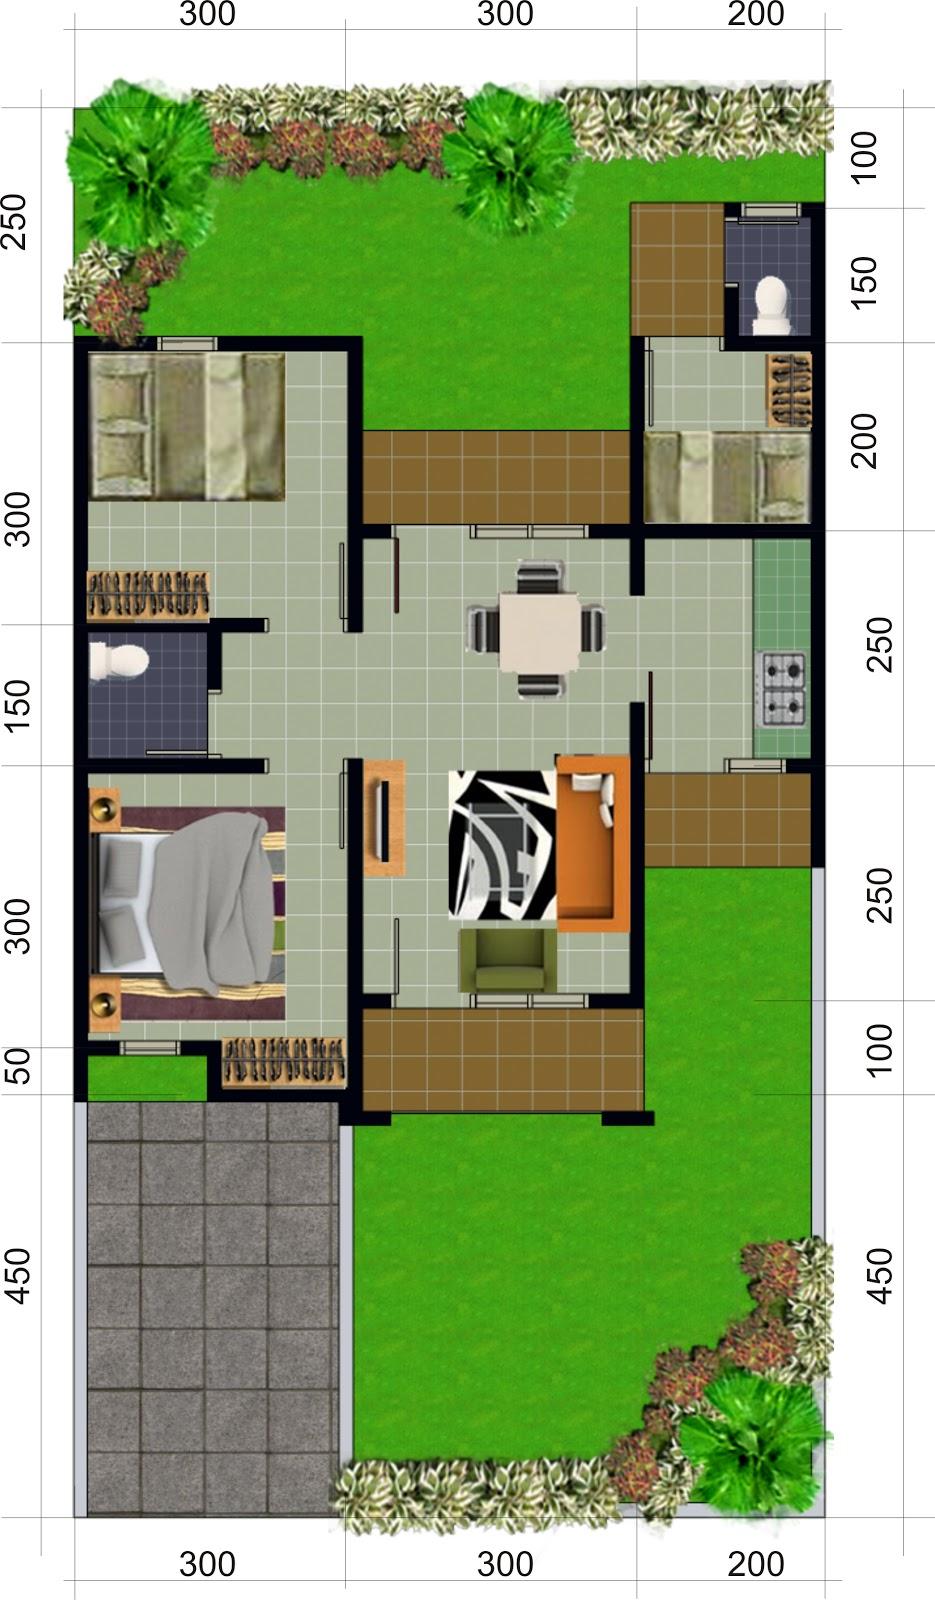 rumah type 56 perumahan pesona intiland